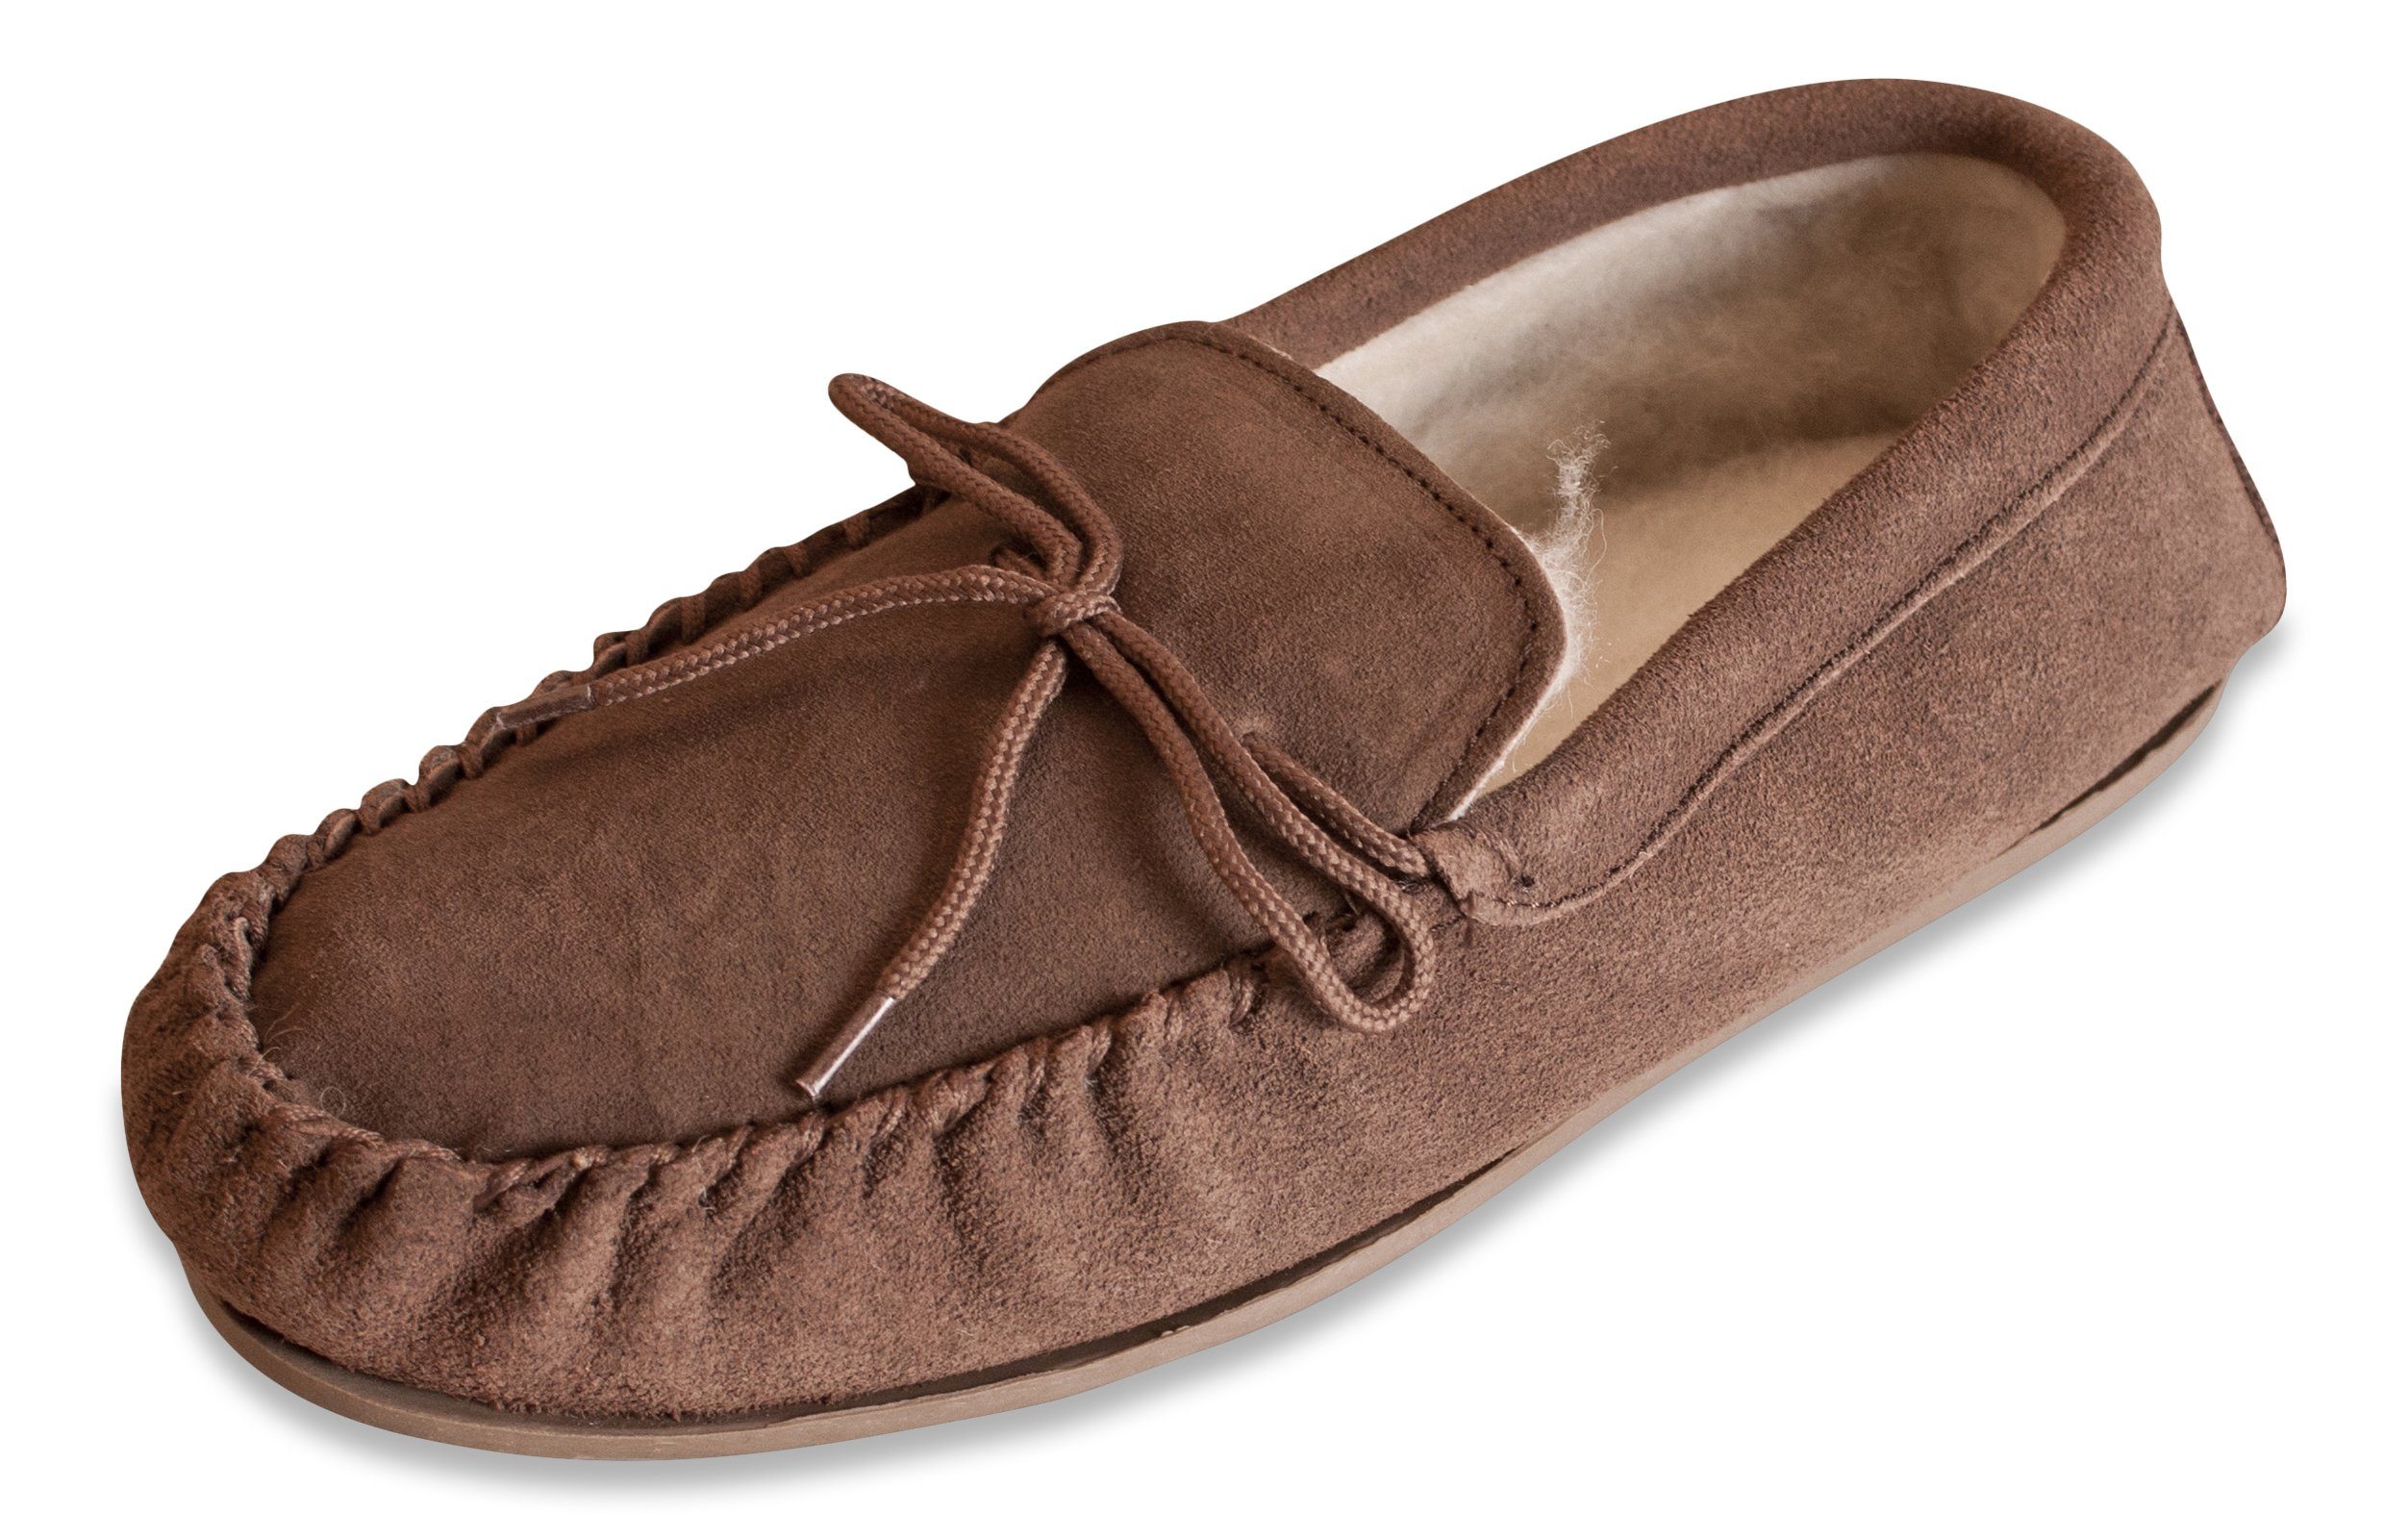 Non-Slip Hard Sole Nordvek Womens Sheepskin Slippers Suede Moccasins # 430-100